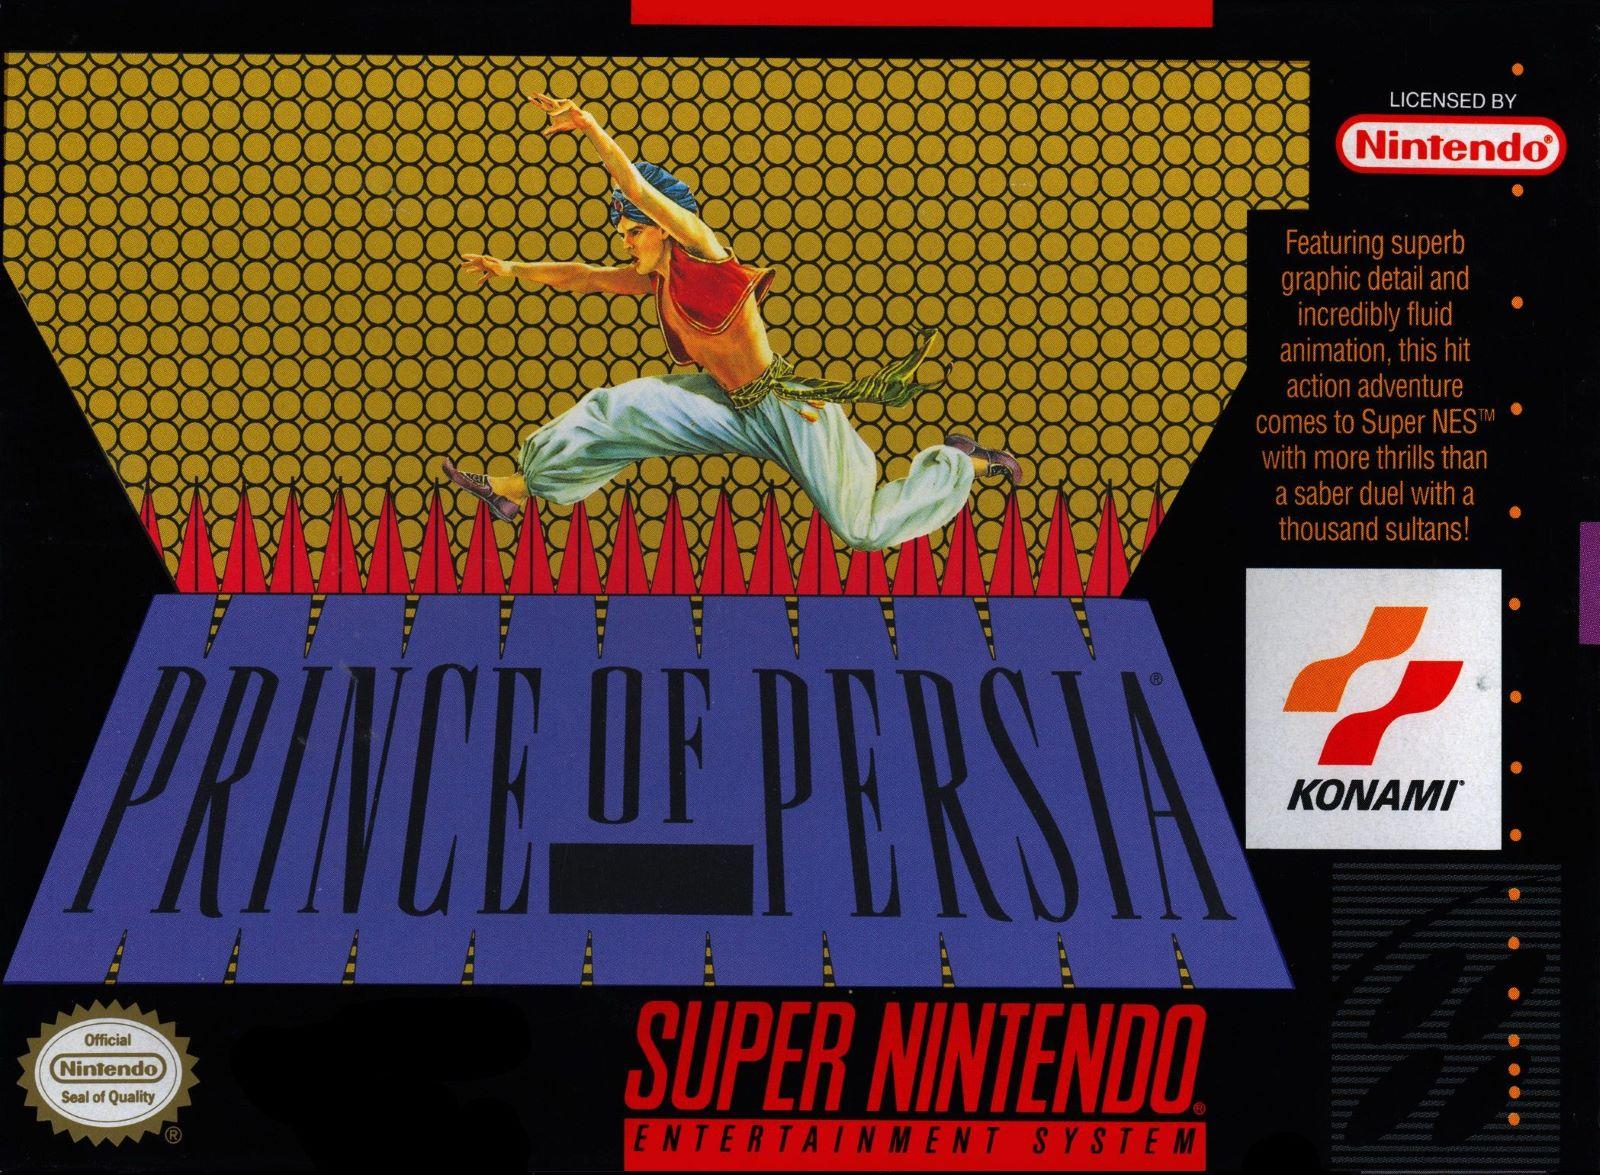 Prince of Persia SNES Super Nintendo